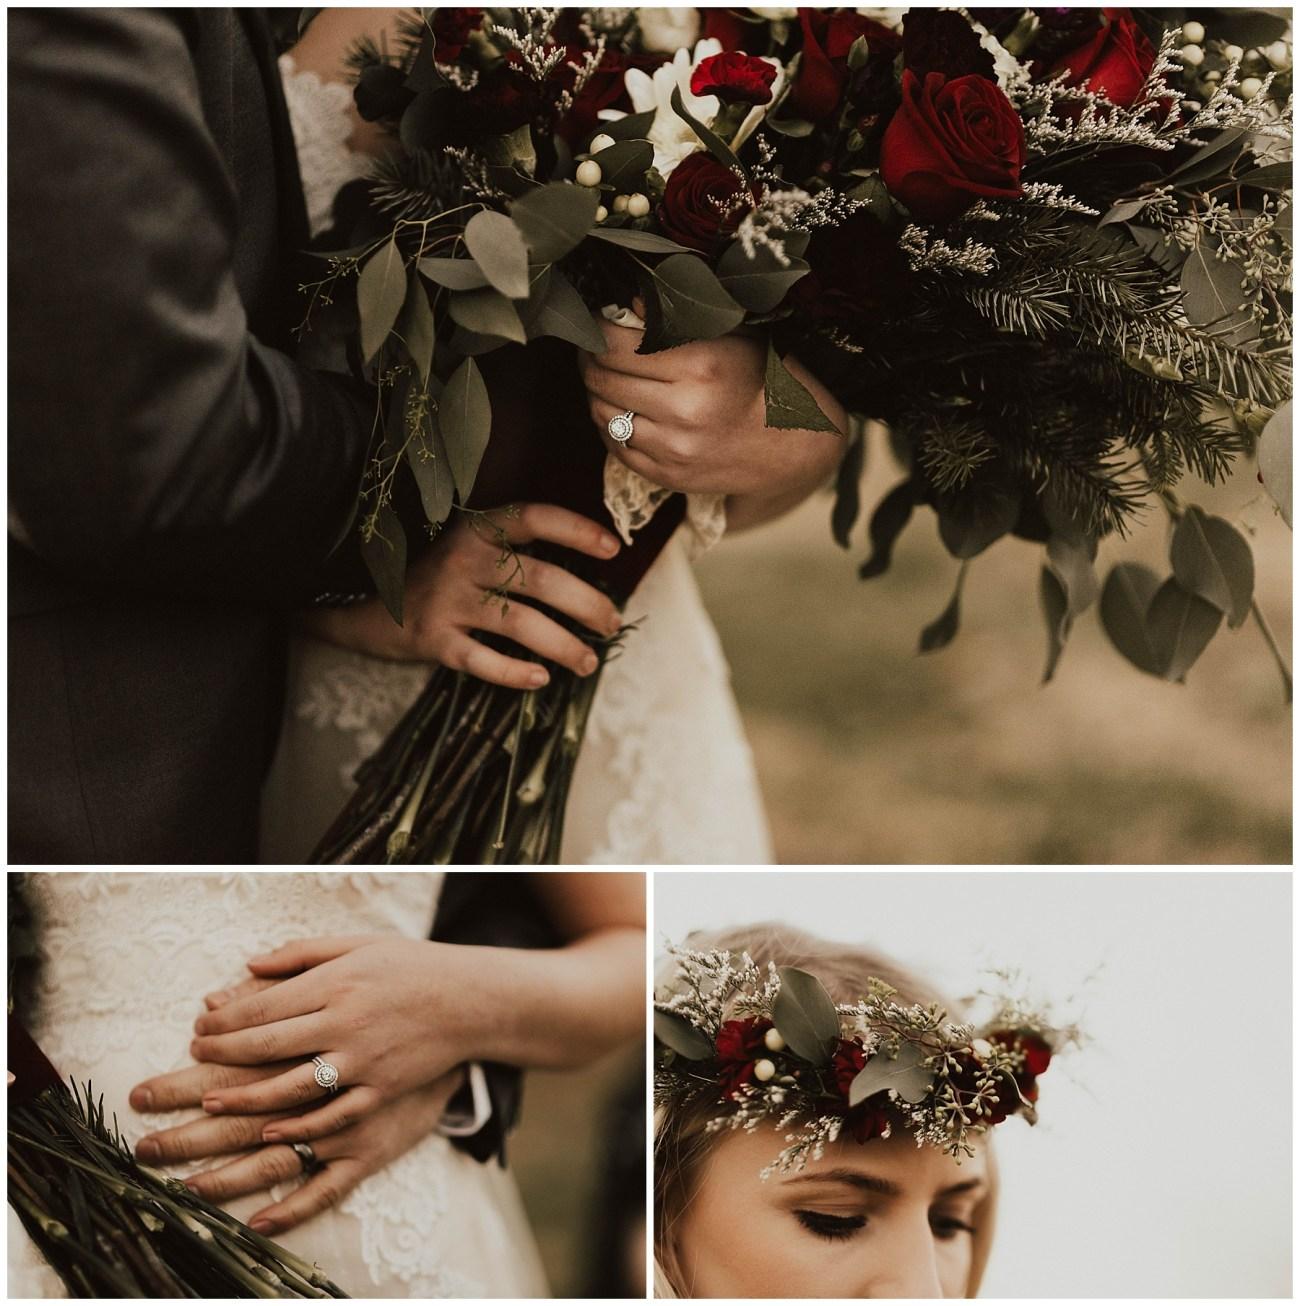 717e826b1 Hannah + Brian    Christmas Cabin Wedding - Lauren F.otography